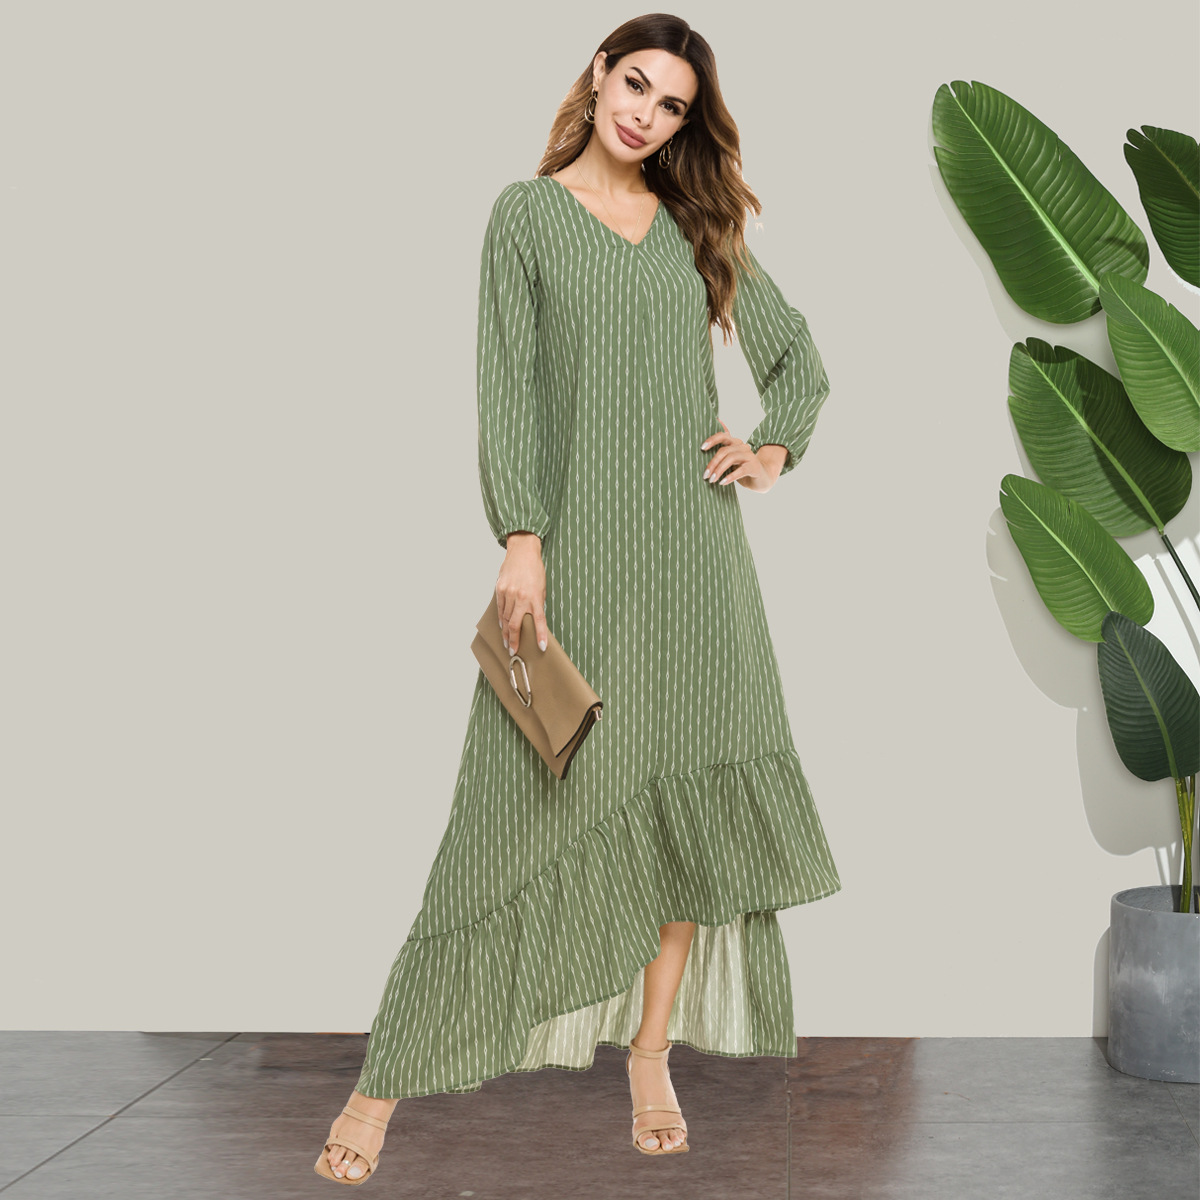 Fashion Autumn Women Dress V-neck Irregular Striped Prints green vestidos muslim abaya islamic clothing party night vestidos